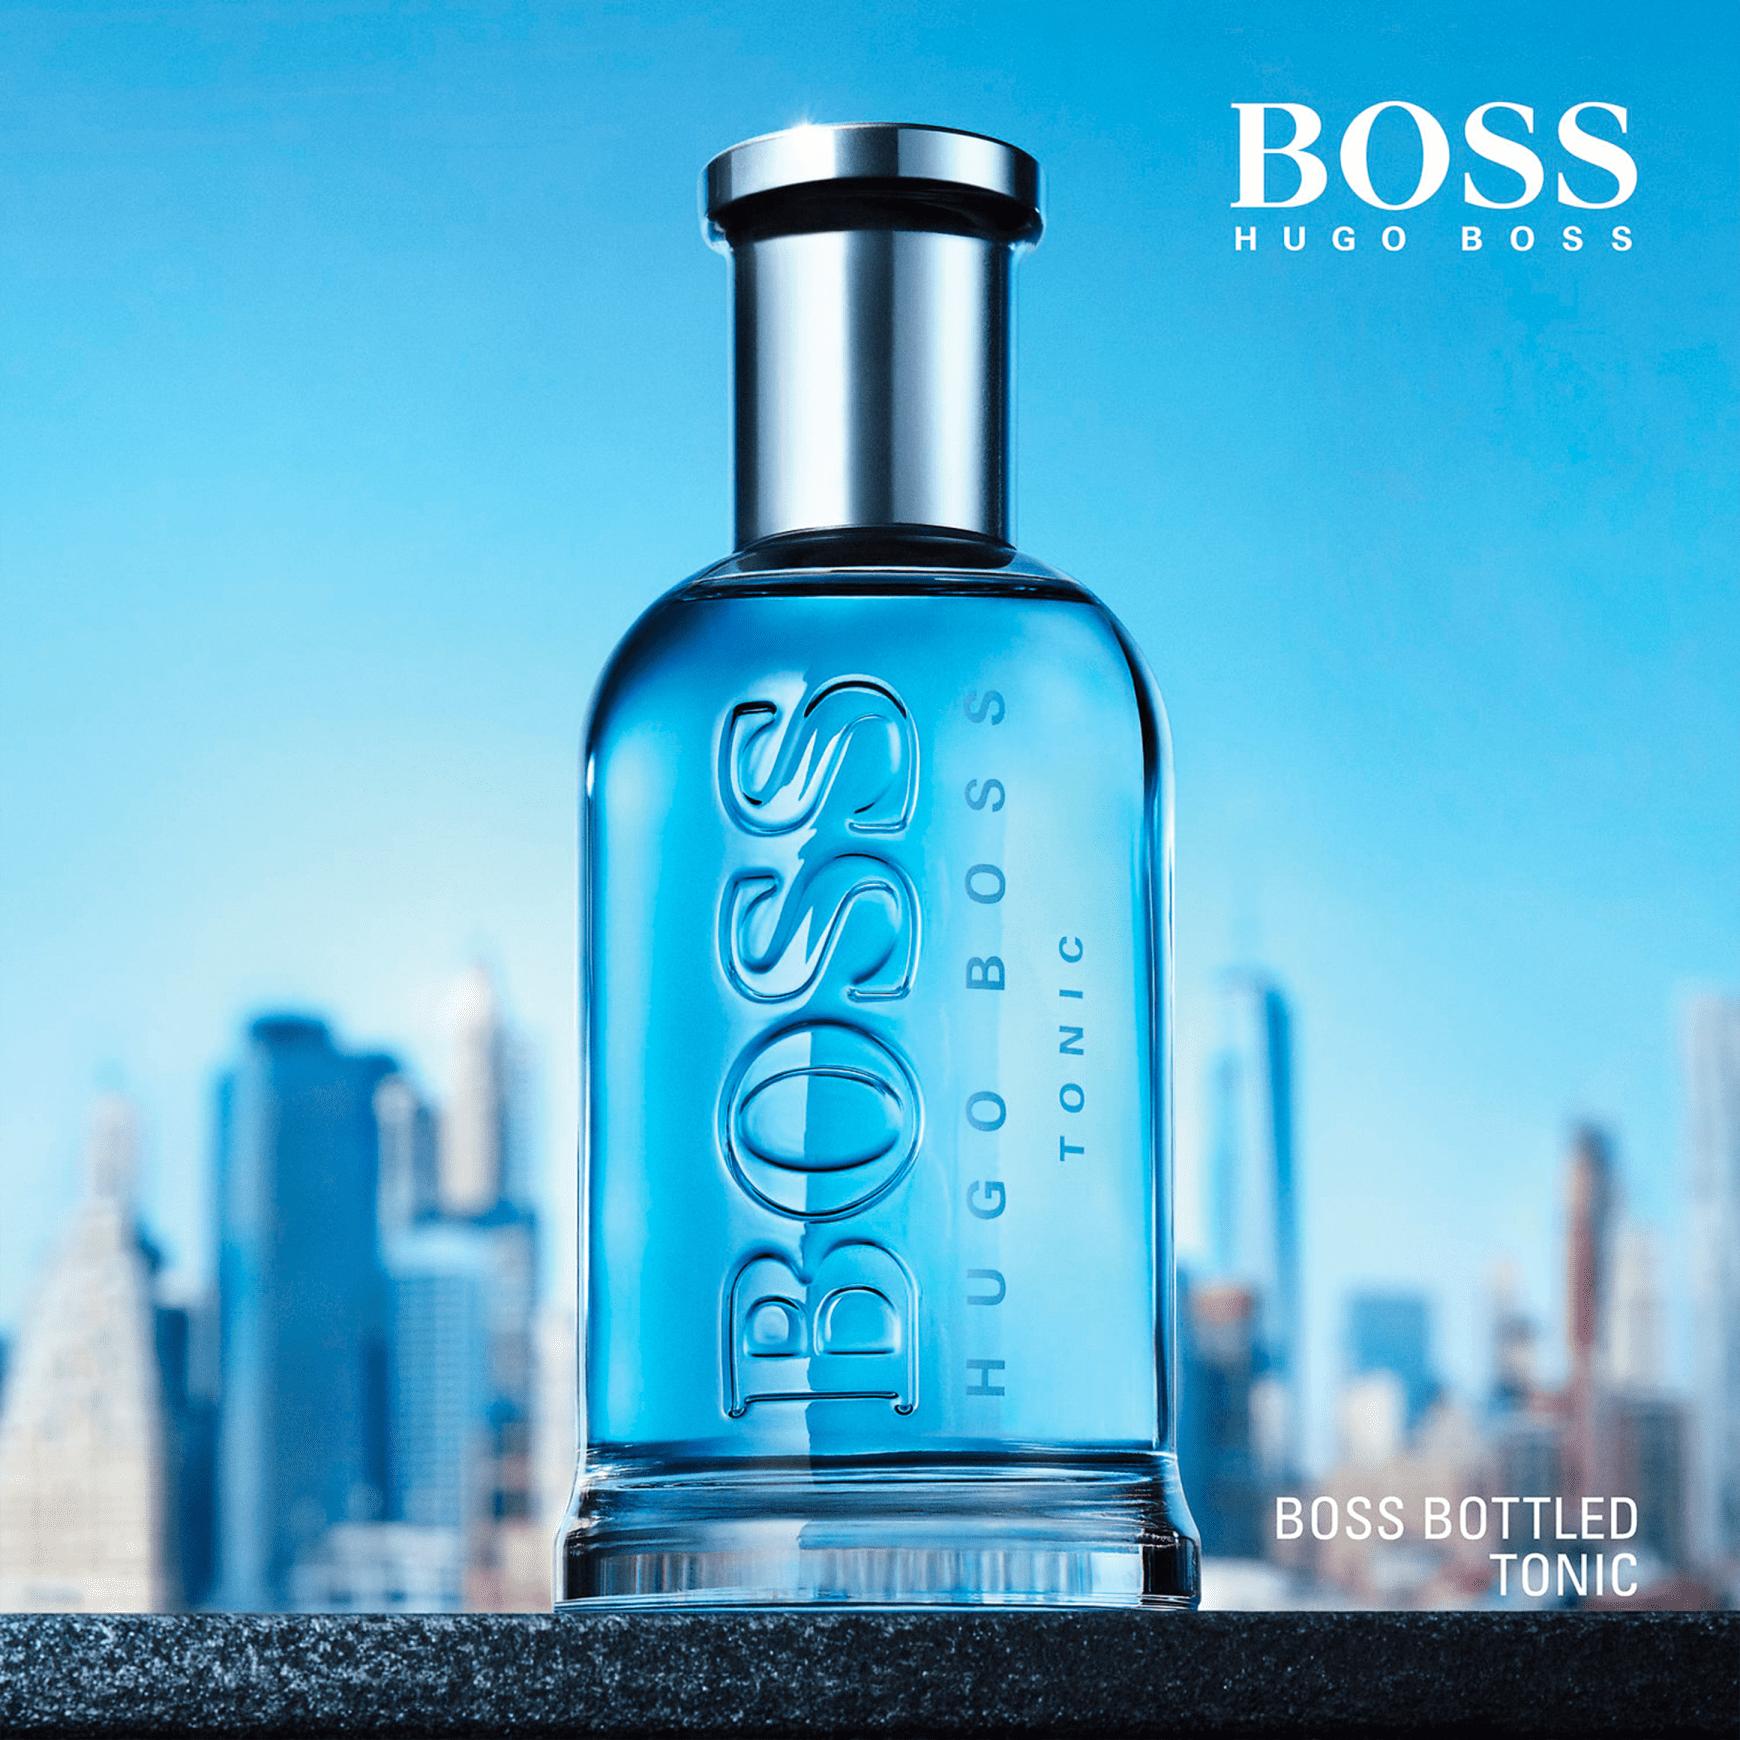 502963858 Boss Bottled Tonic Hugo Boss Eau de Toilette - Perfume Masculino 50ml